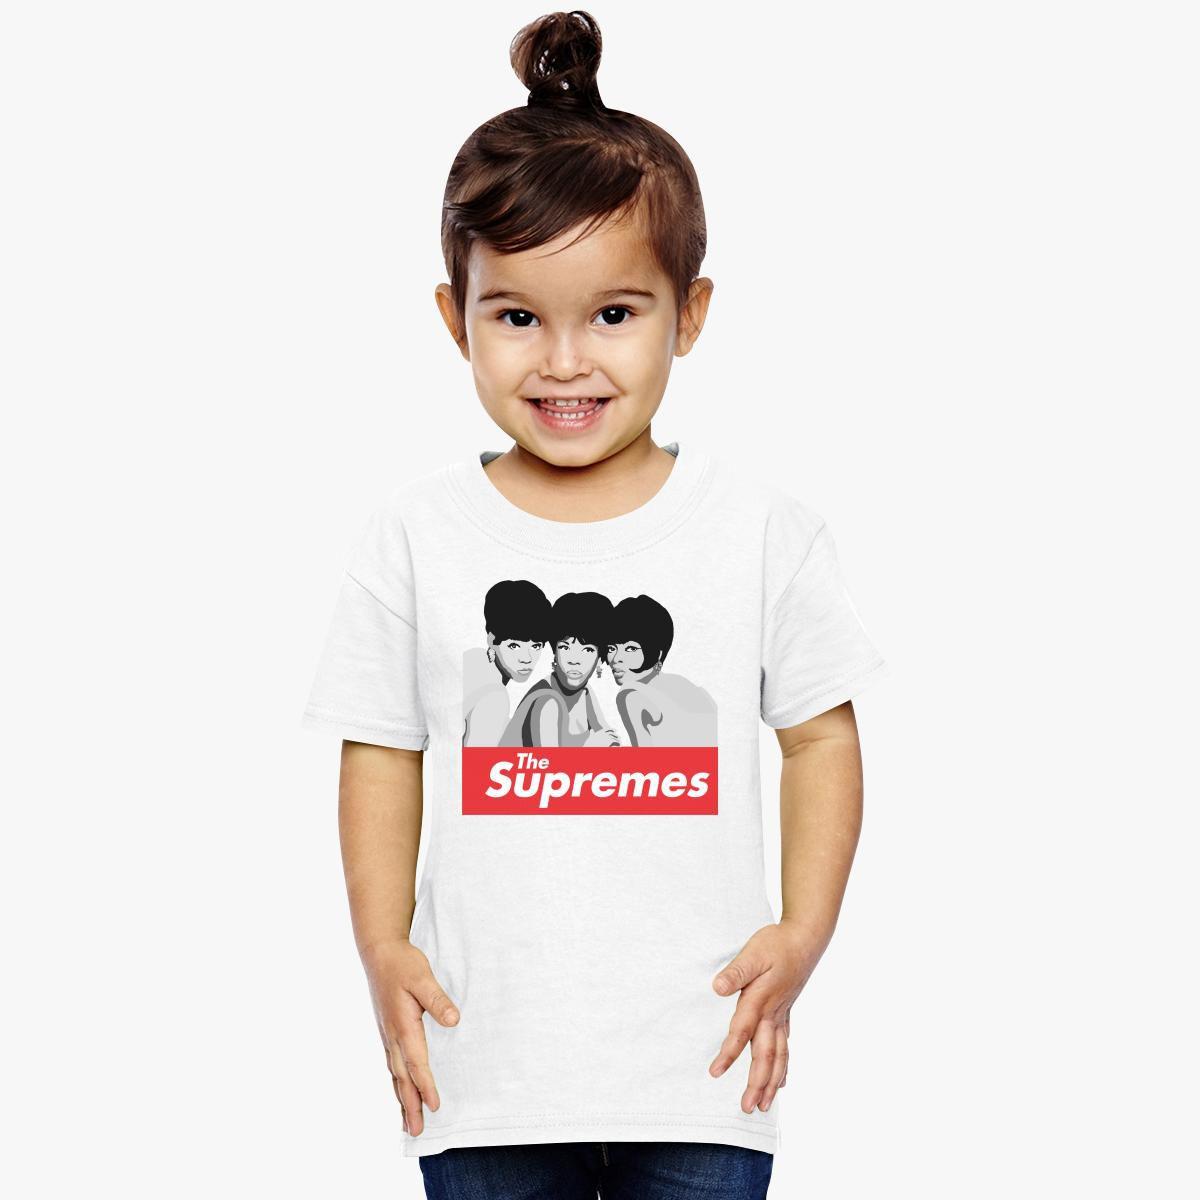 8d940ebc The Supremes Toddler T-shirt - Customon